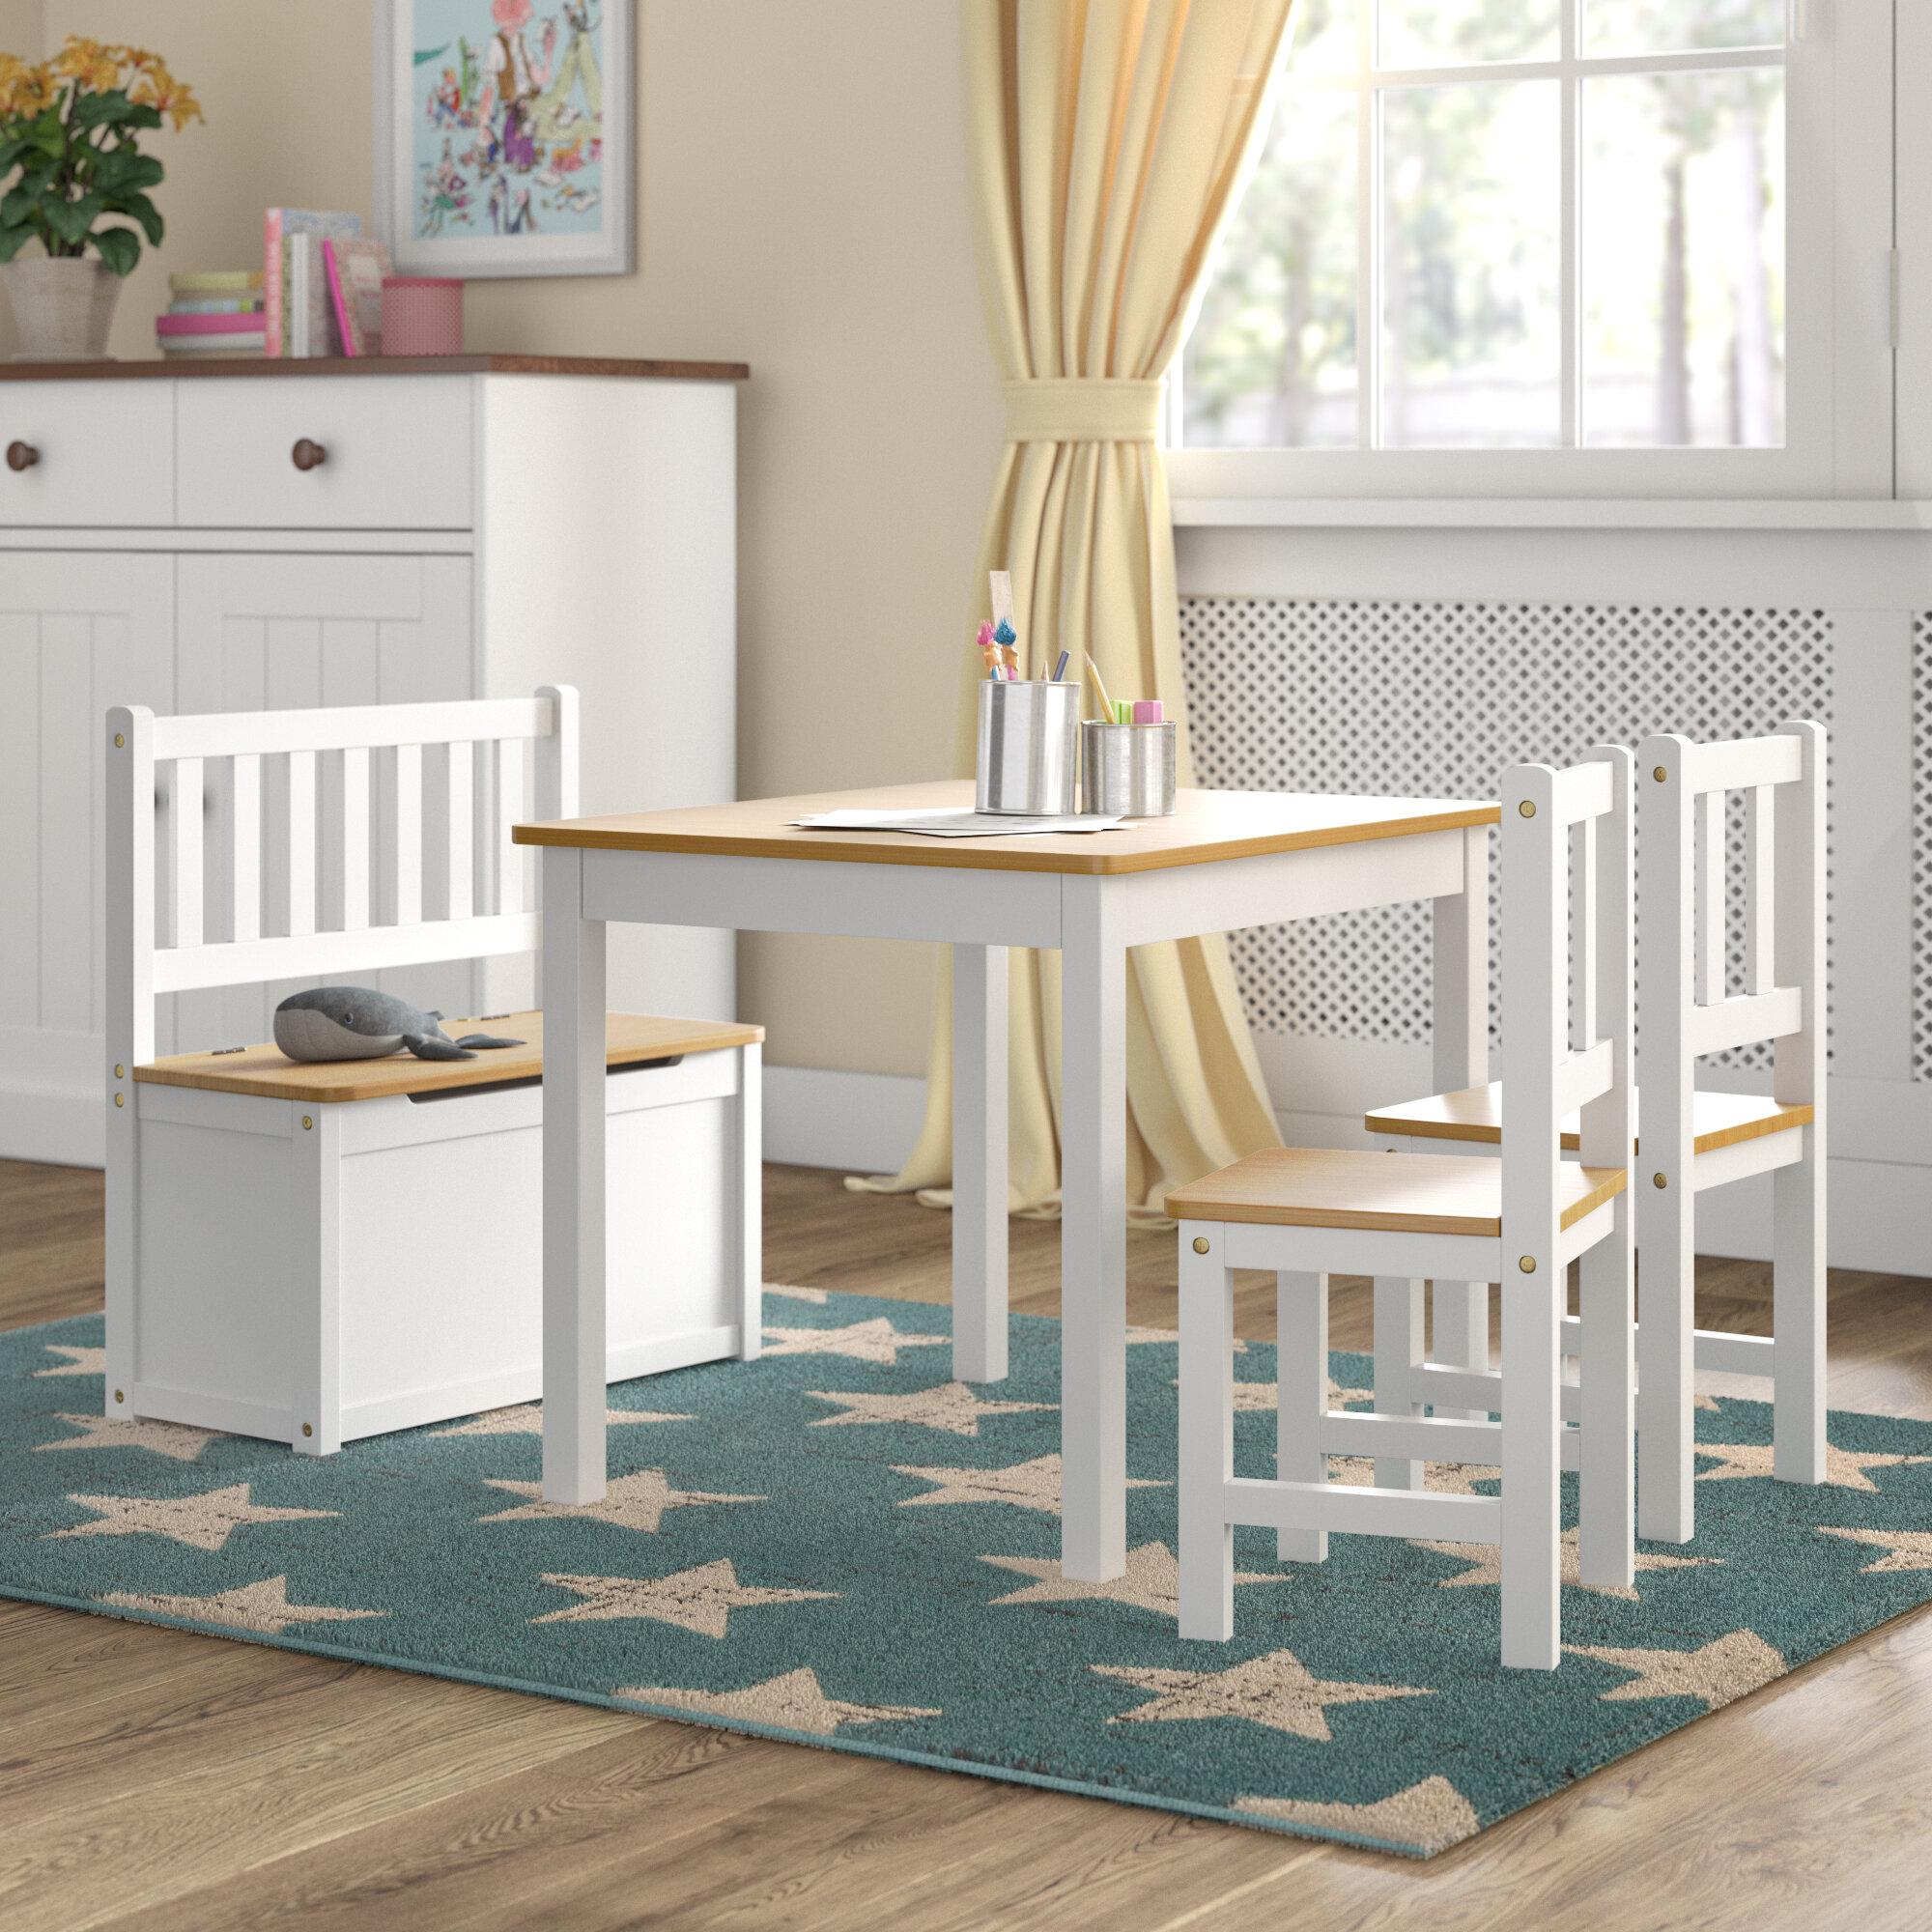 b04b9fb89b7 Harriet Bee Erick Children's 4 Piece Table and Chair Set & Reviews |  Wayfair.co.uk